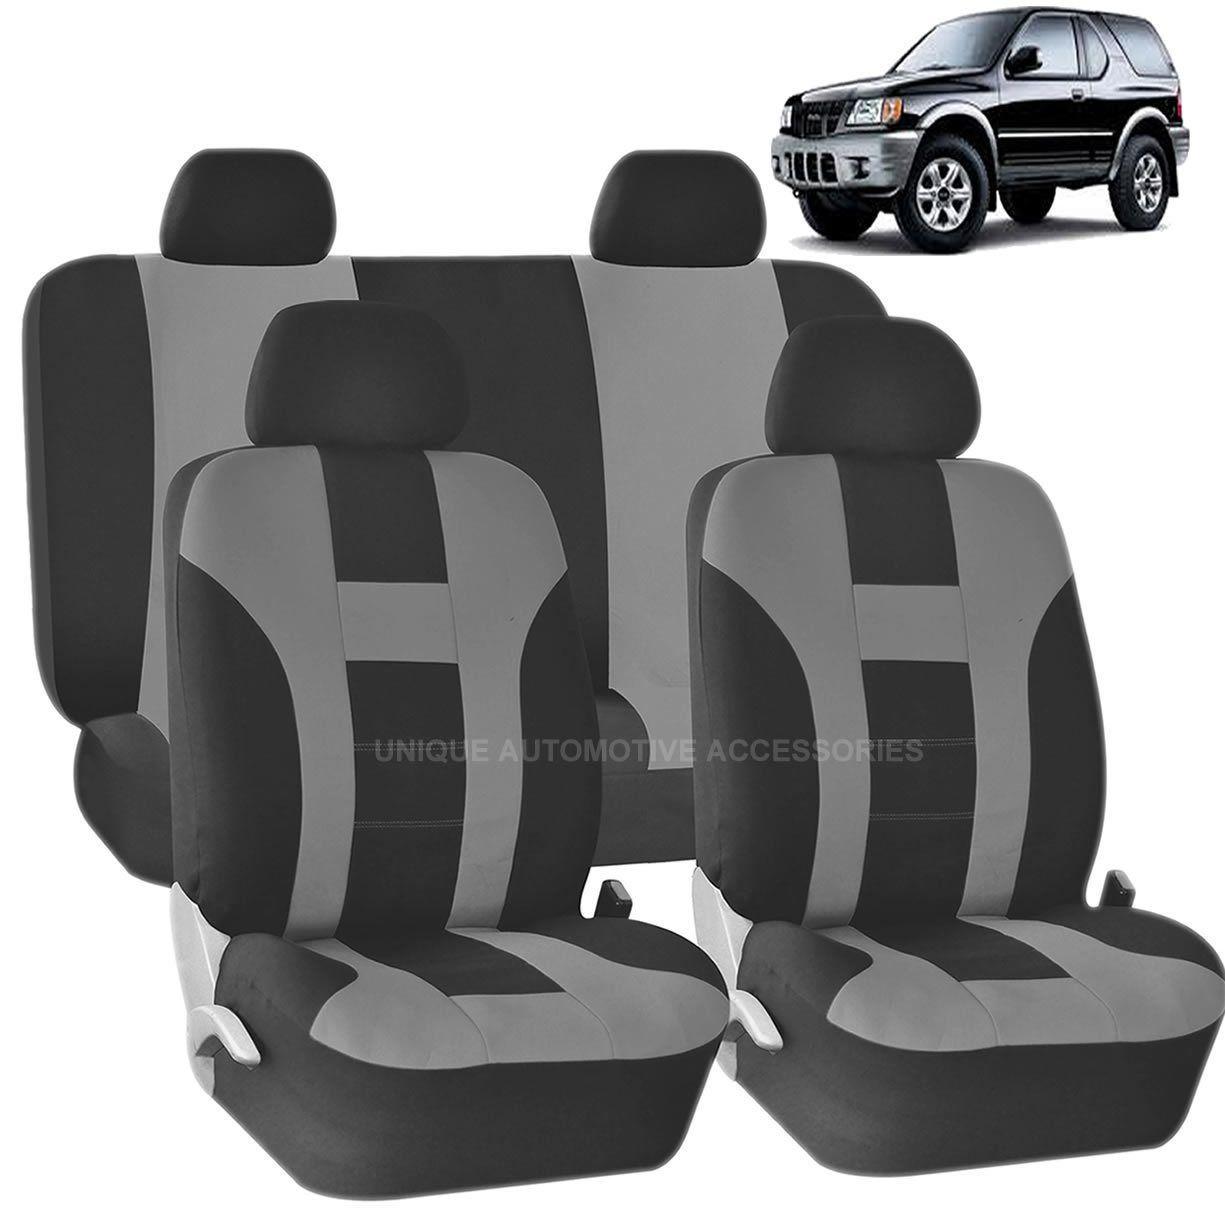 Car seat covers fit Nissan Pathfinder black//grey  leatherette full set